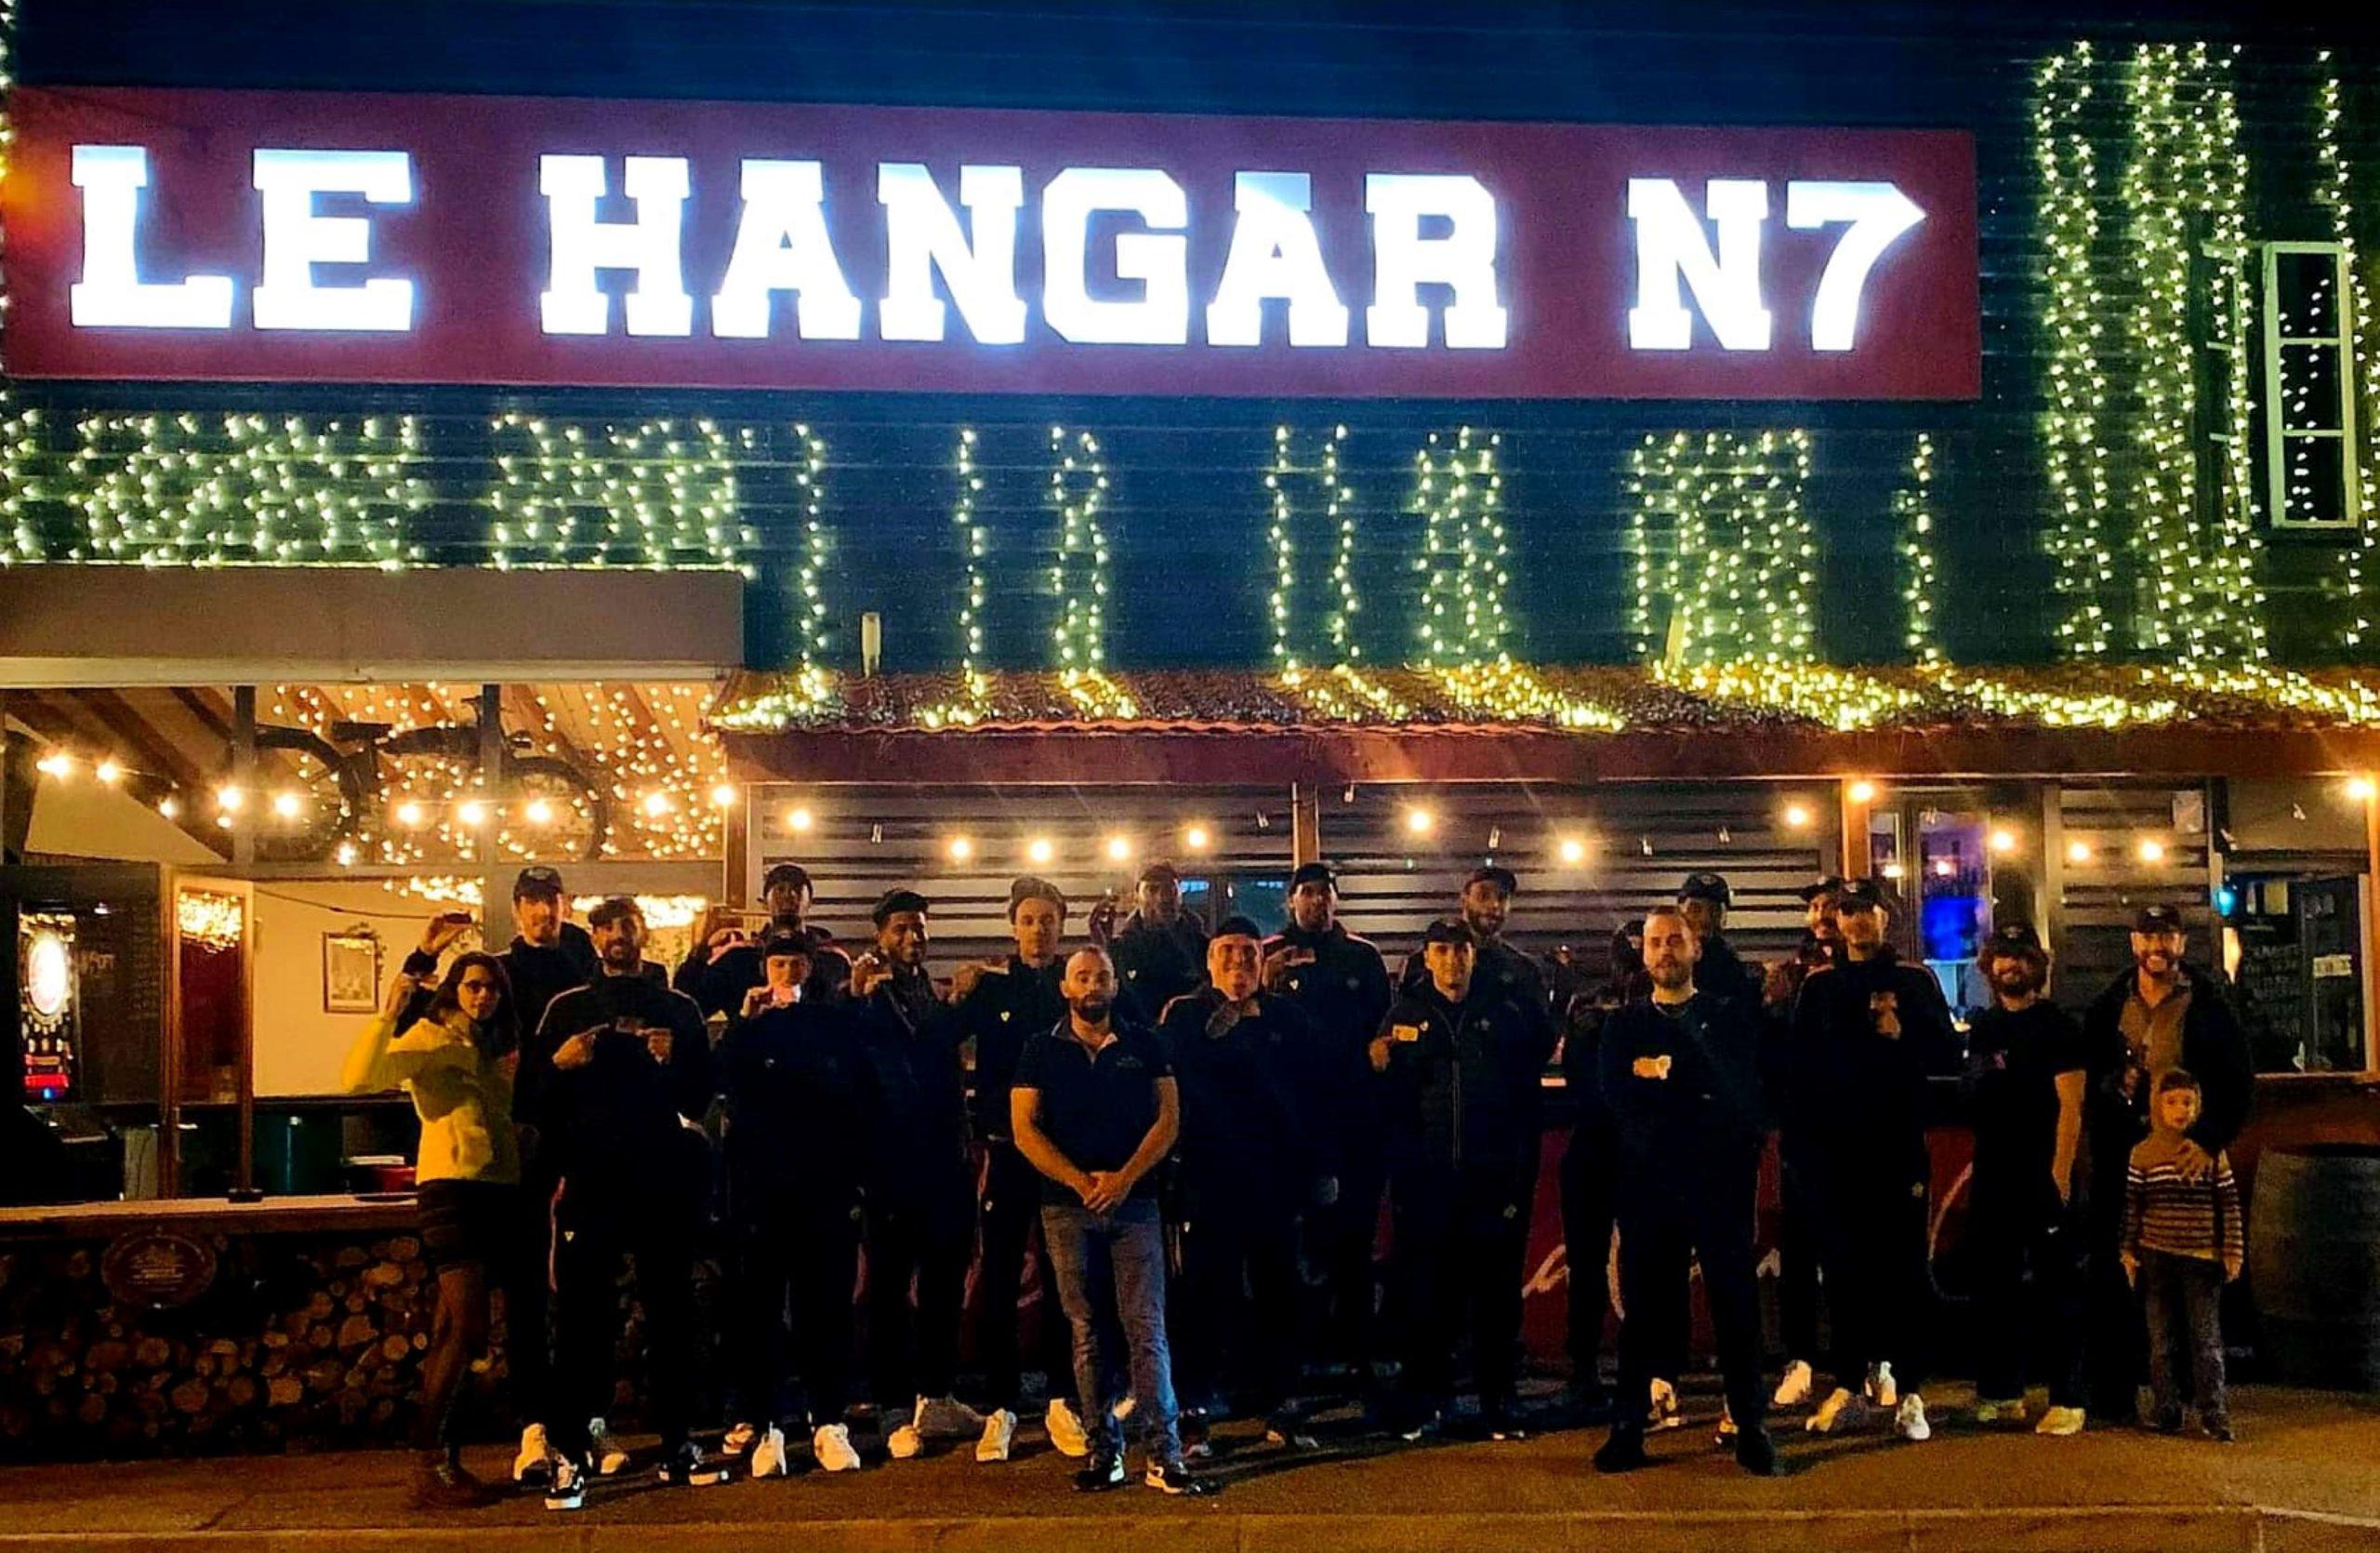 Inauguration du partenariat avec Le Hangar N7